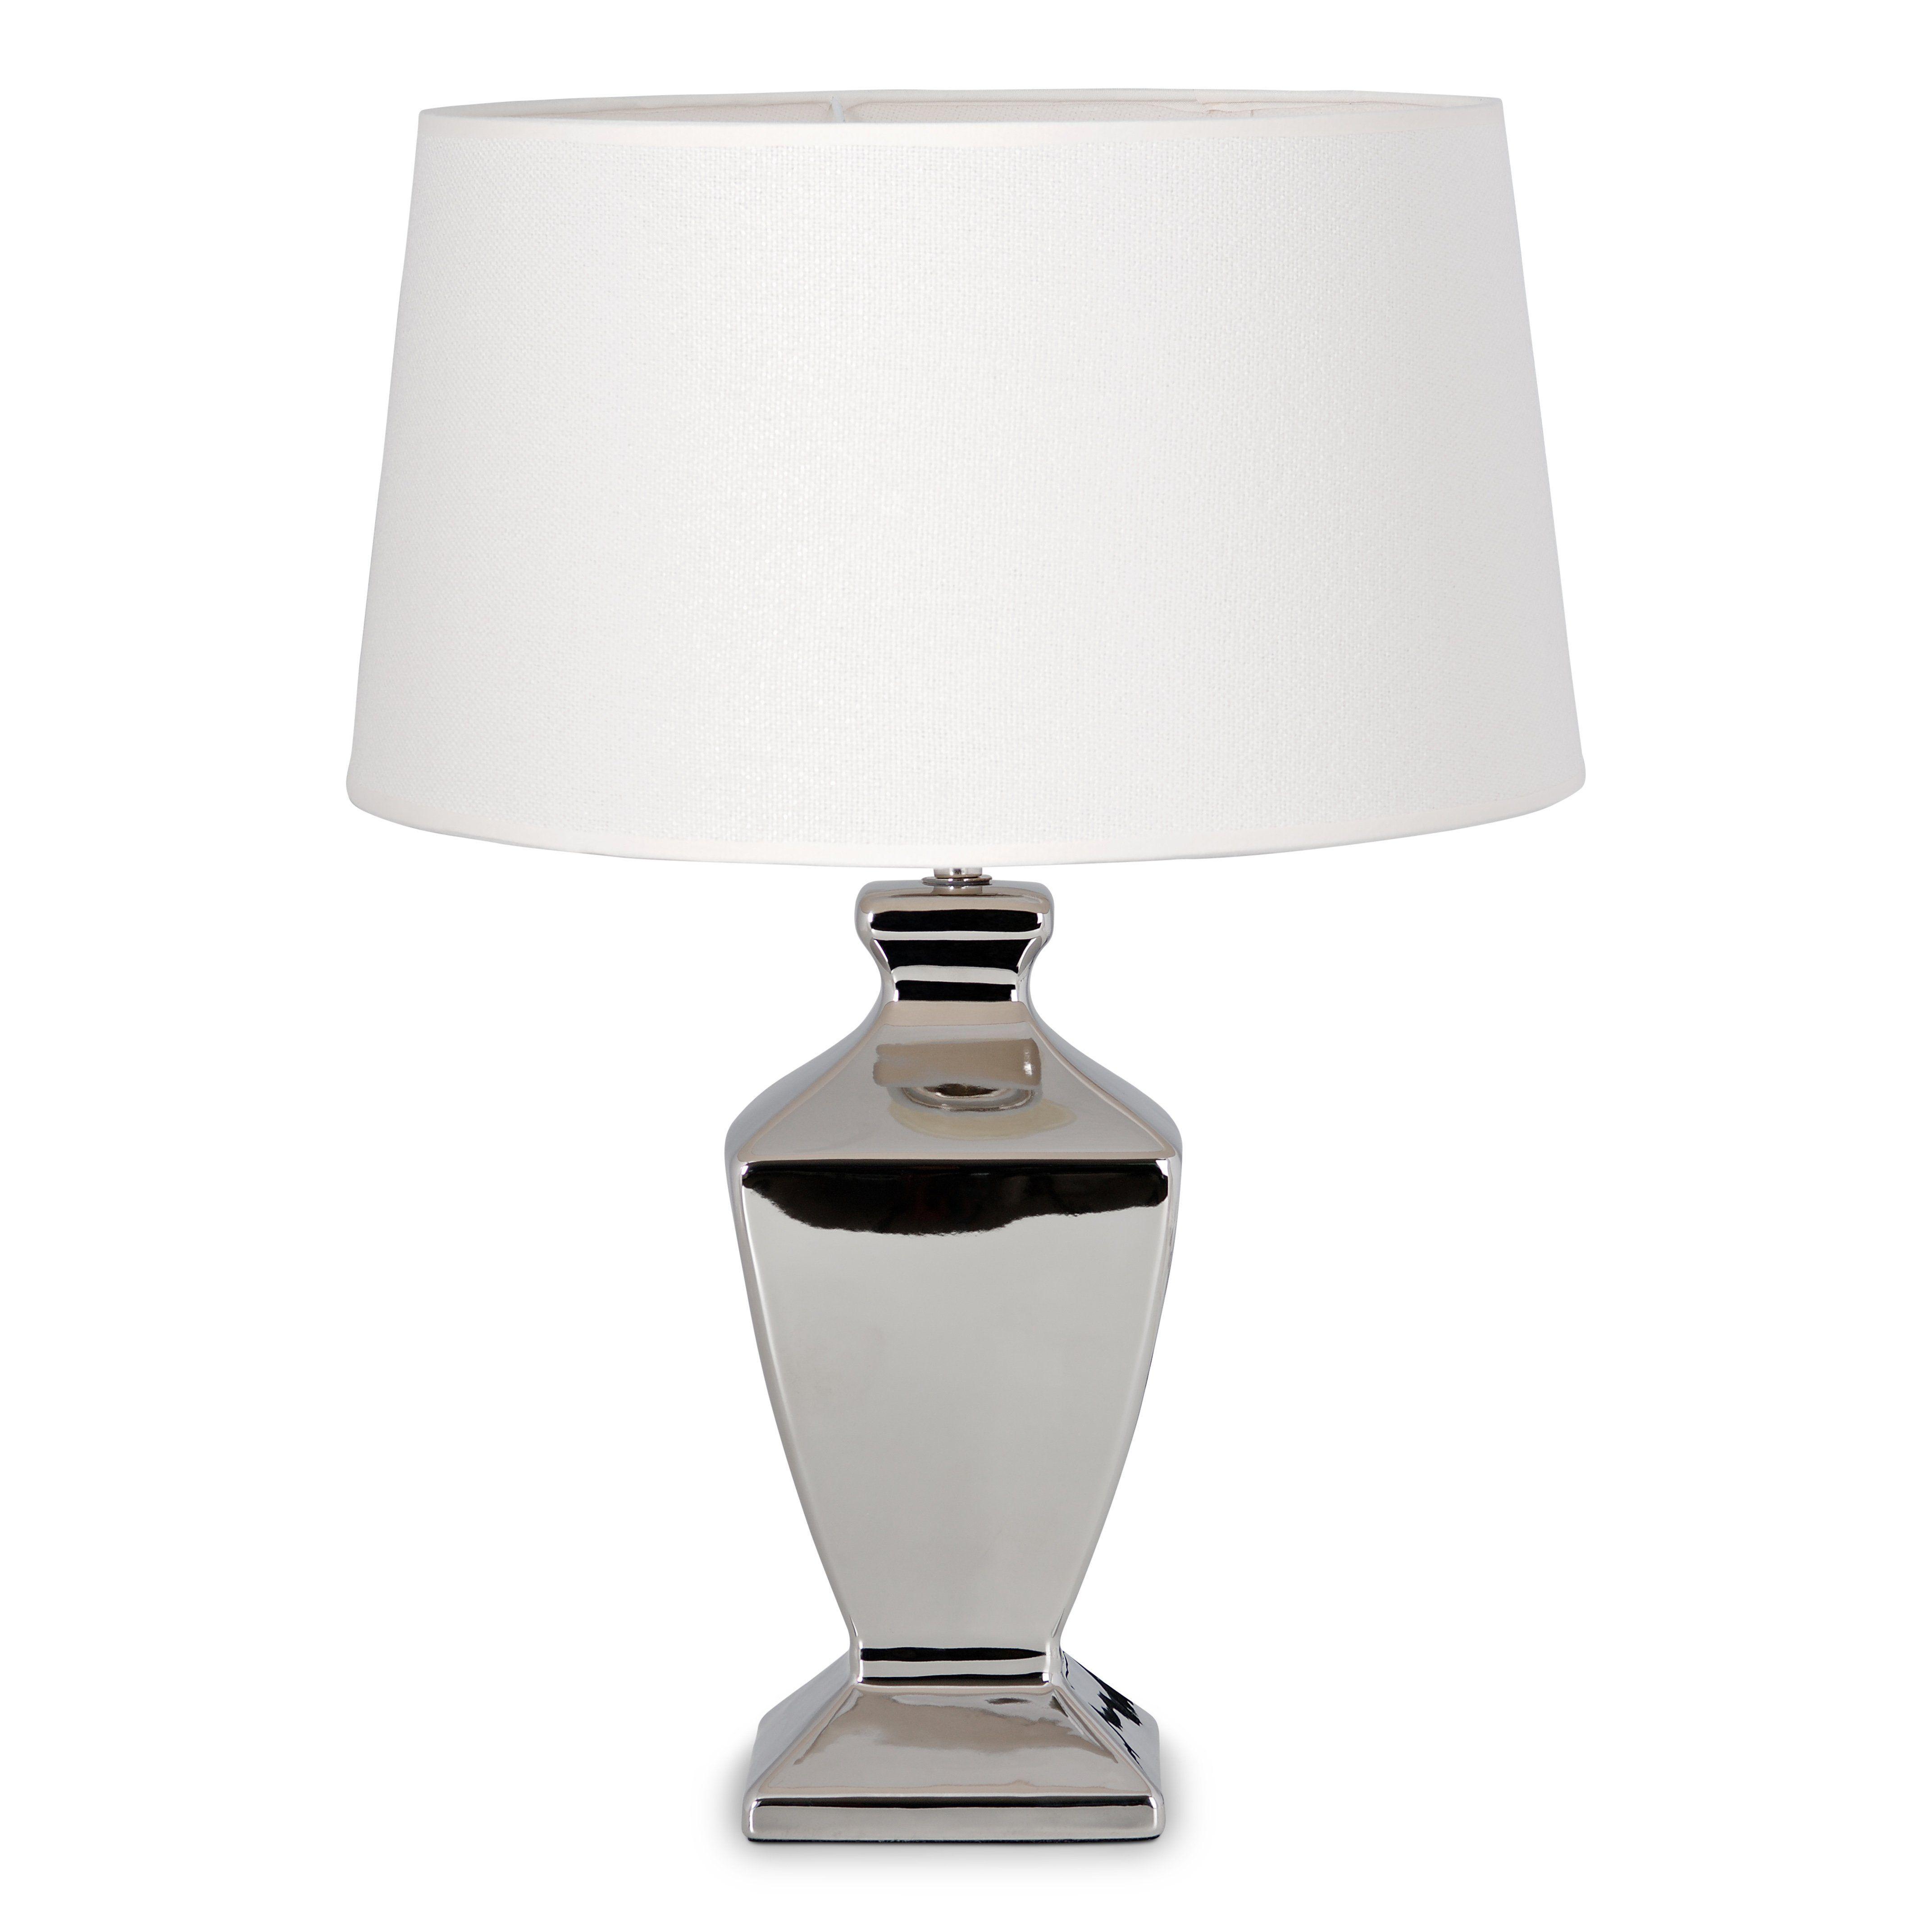 Home sweet home tafellamp Class met lampenkap Melrose - warmwit